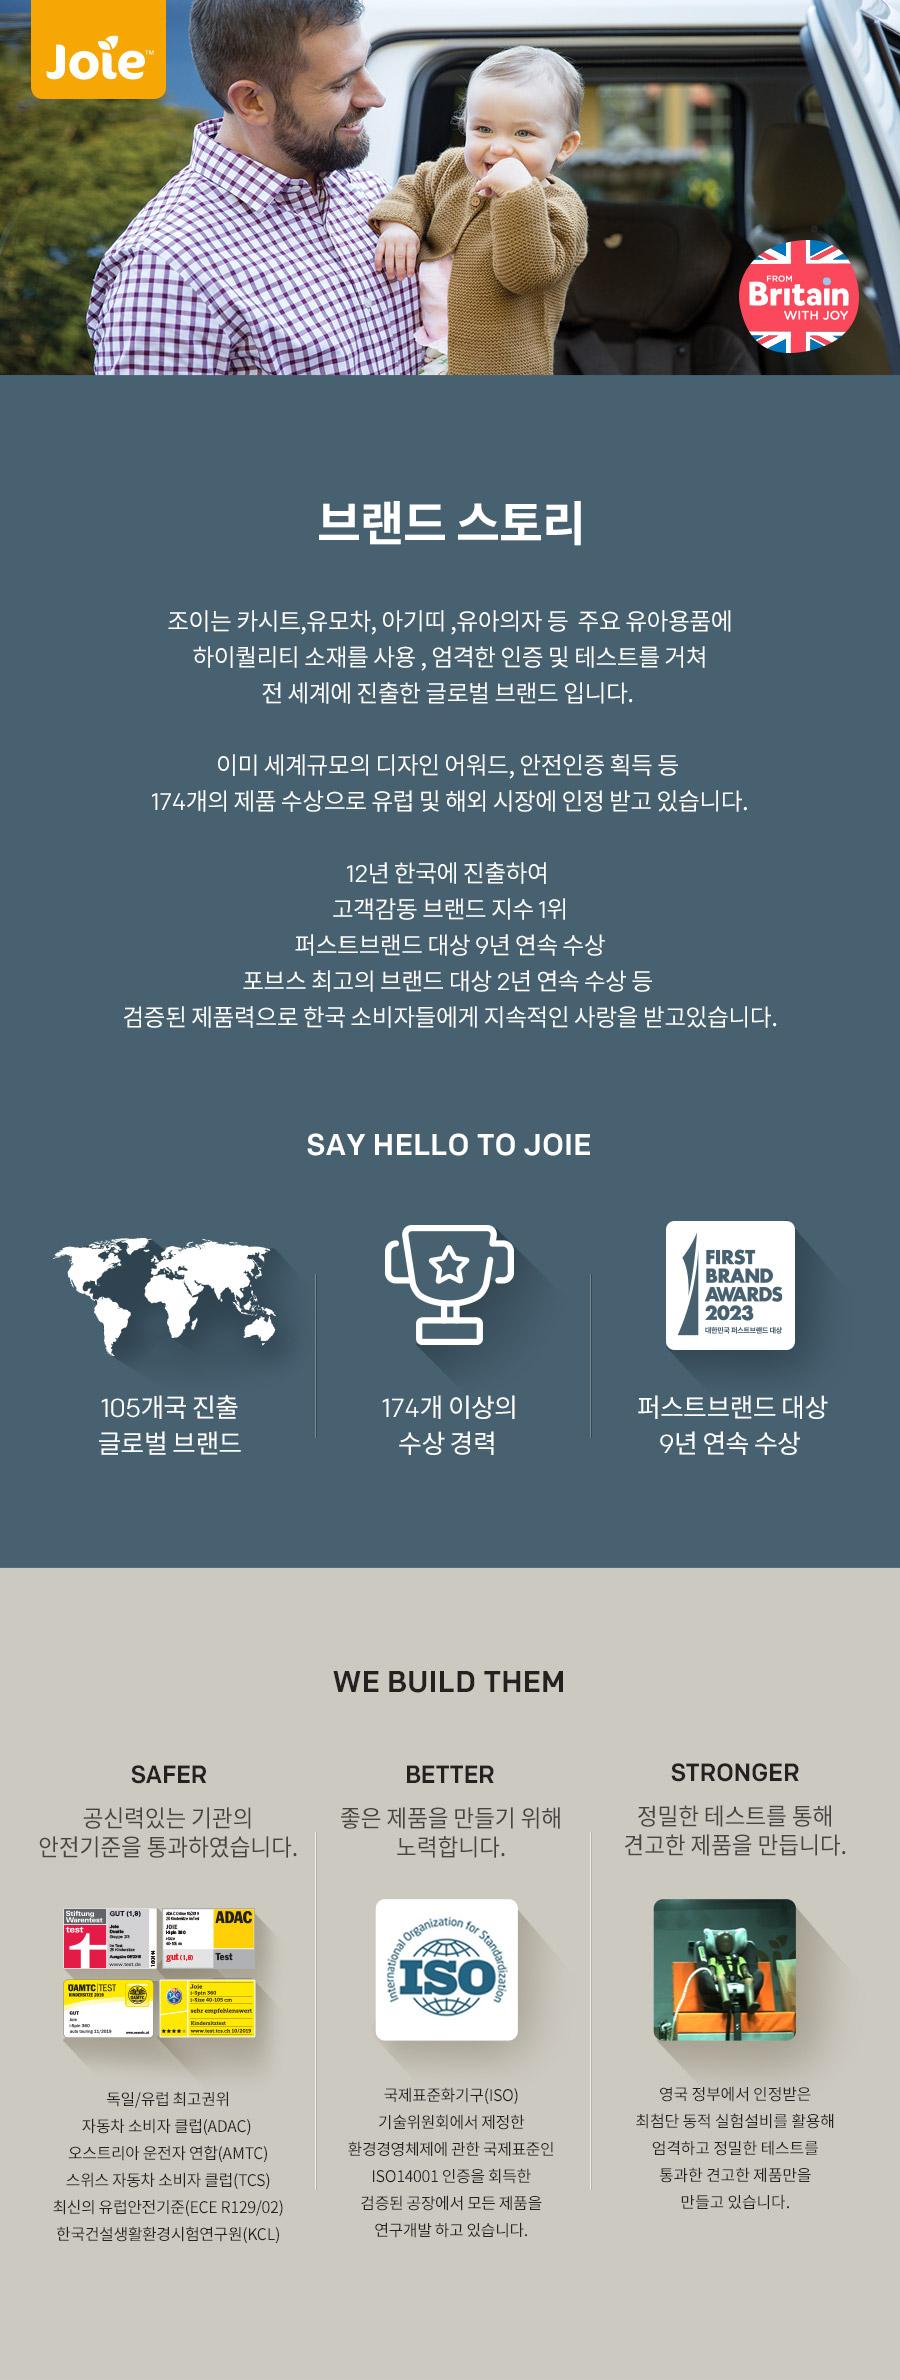 joie_brandstory